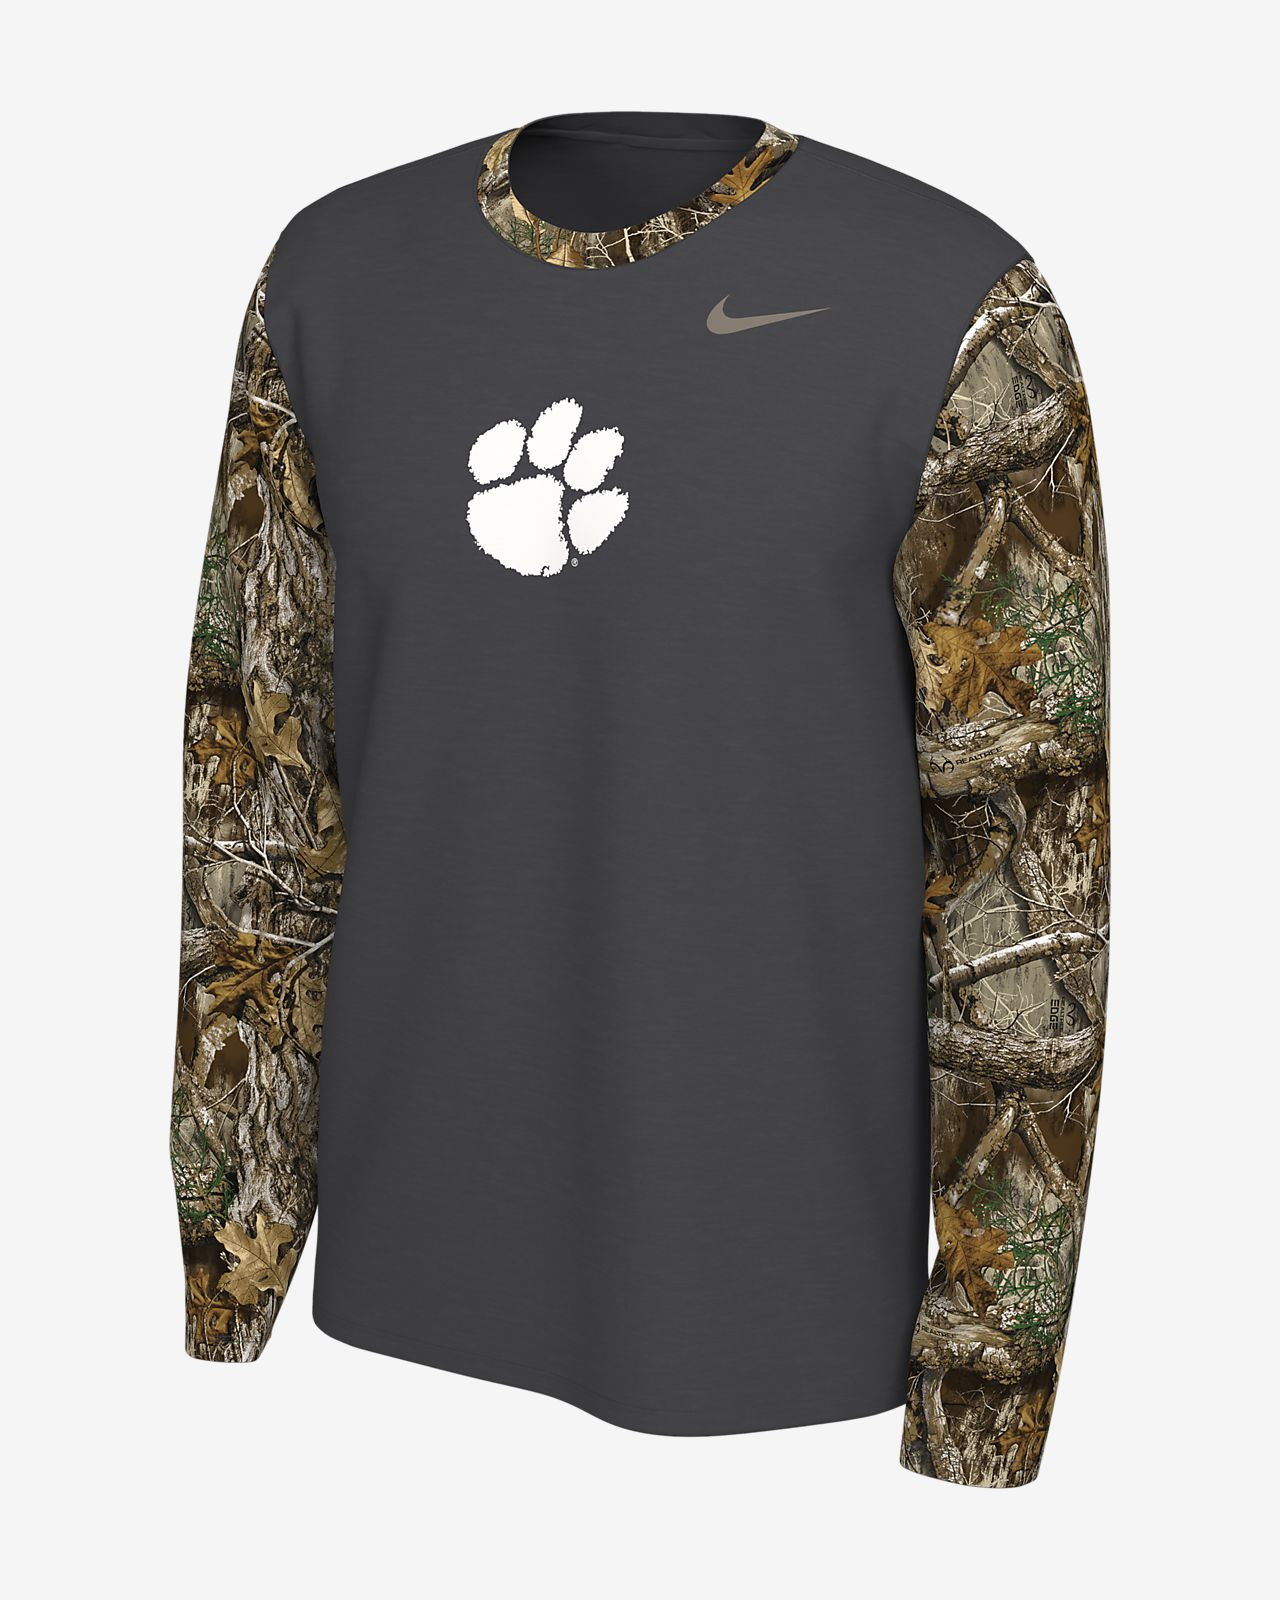 Nike College (Clemson) Realtree® Men's Long-Sleeve T-Shirt